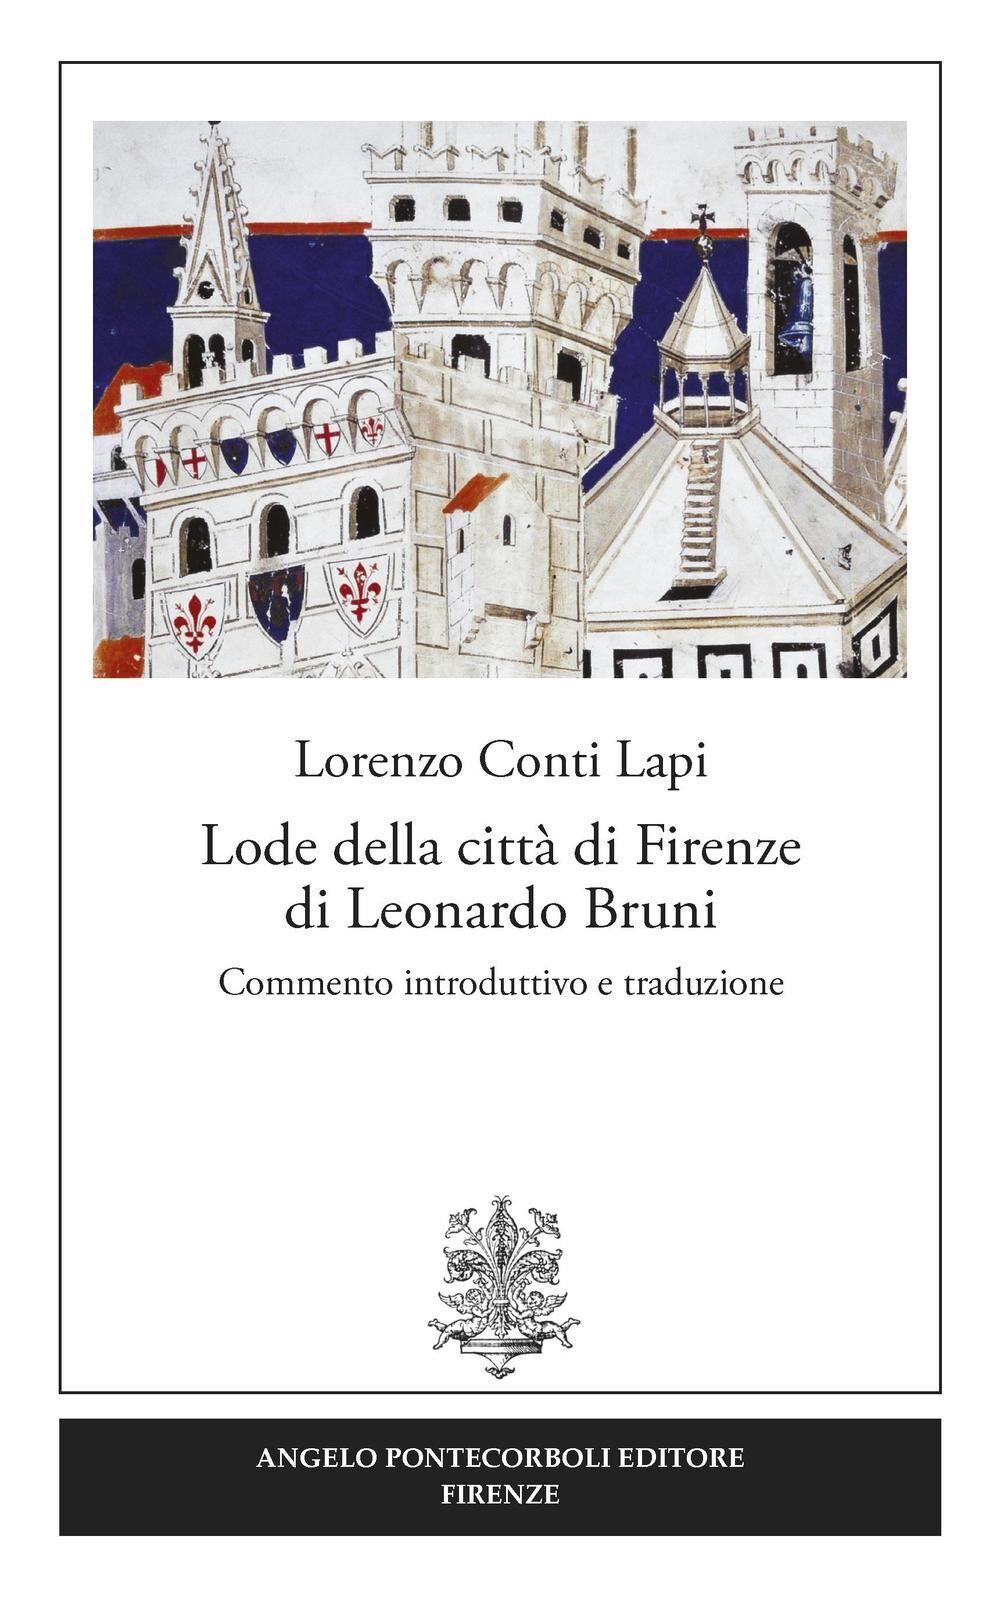 Lode della città di Firenze di Leonardo Bruni